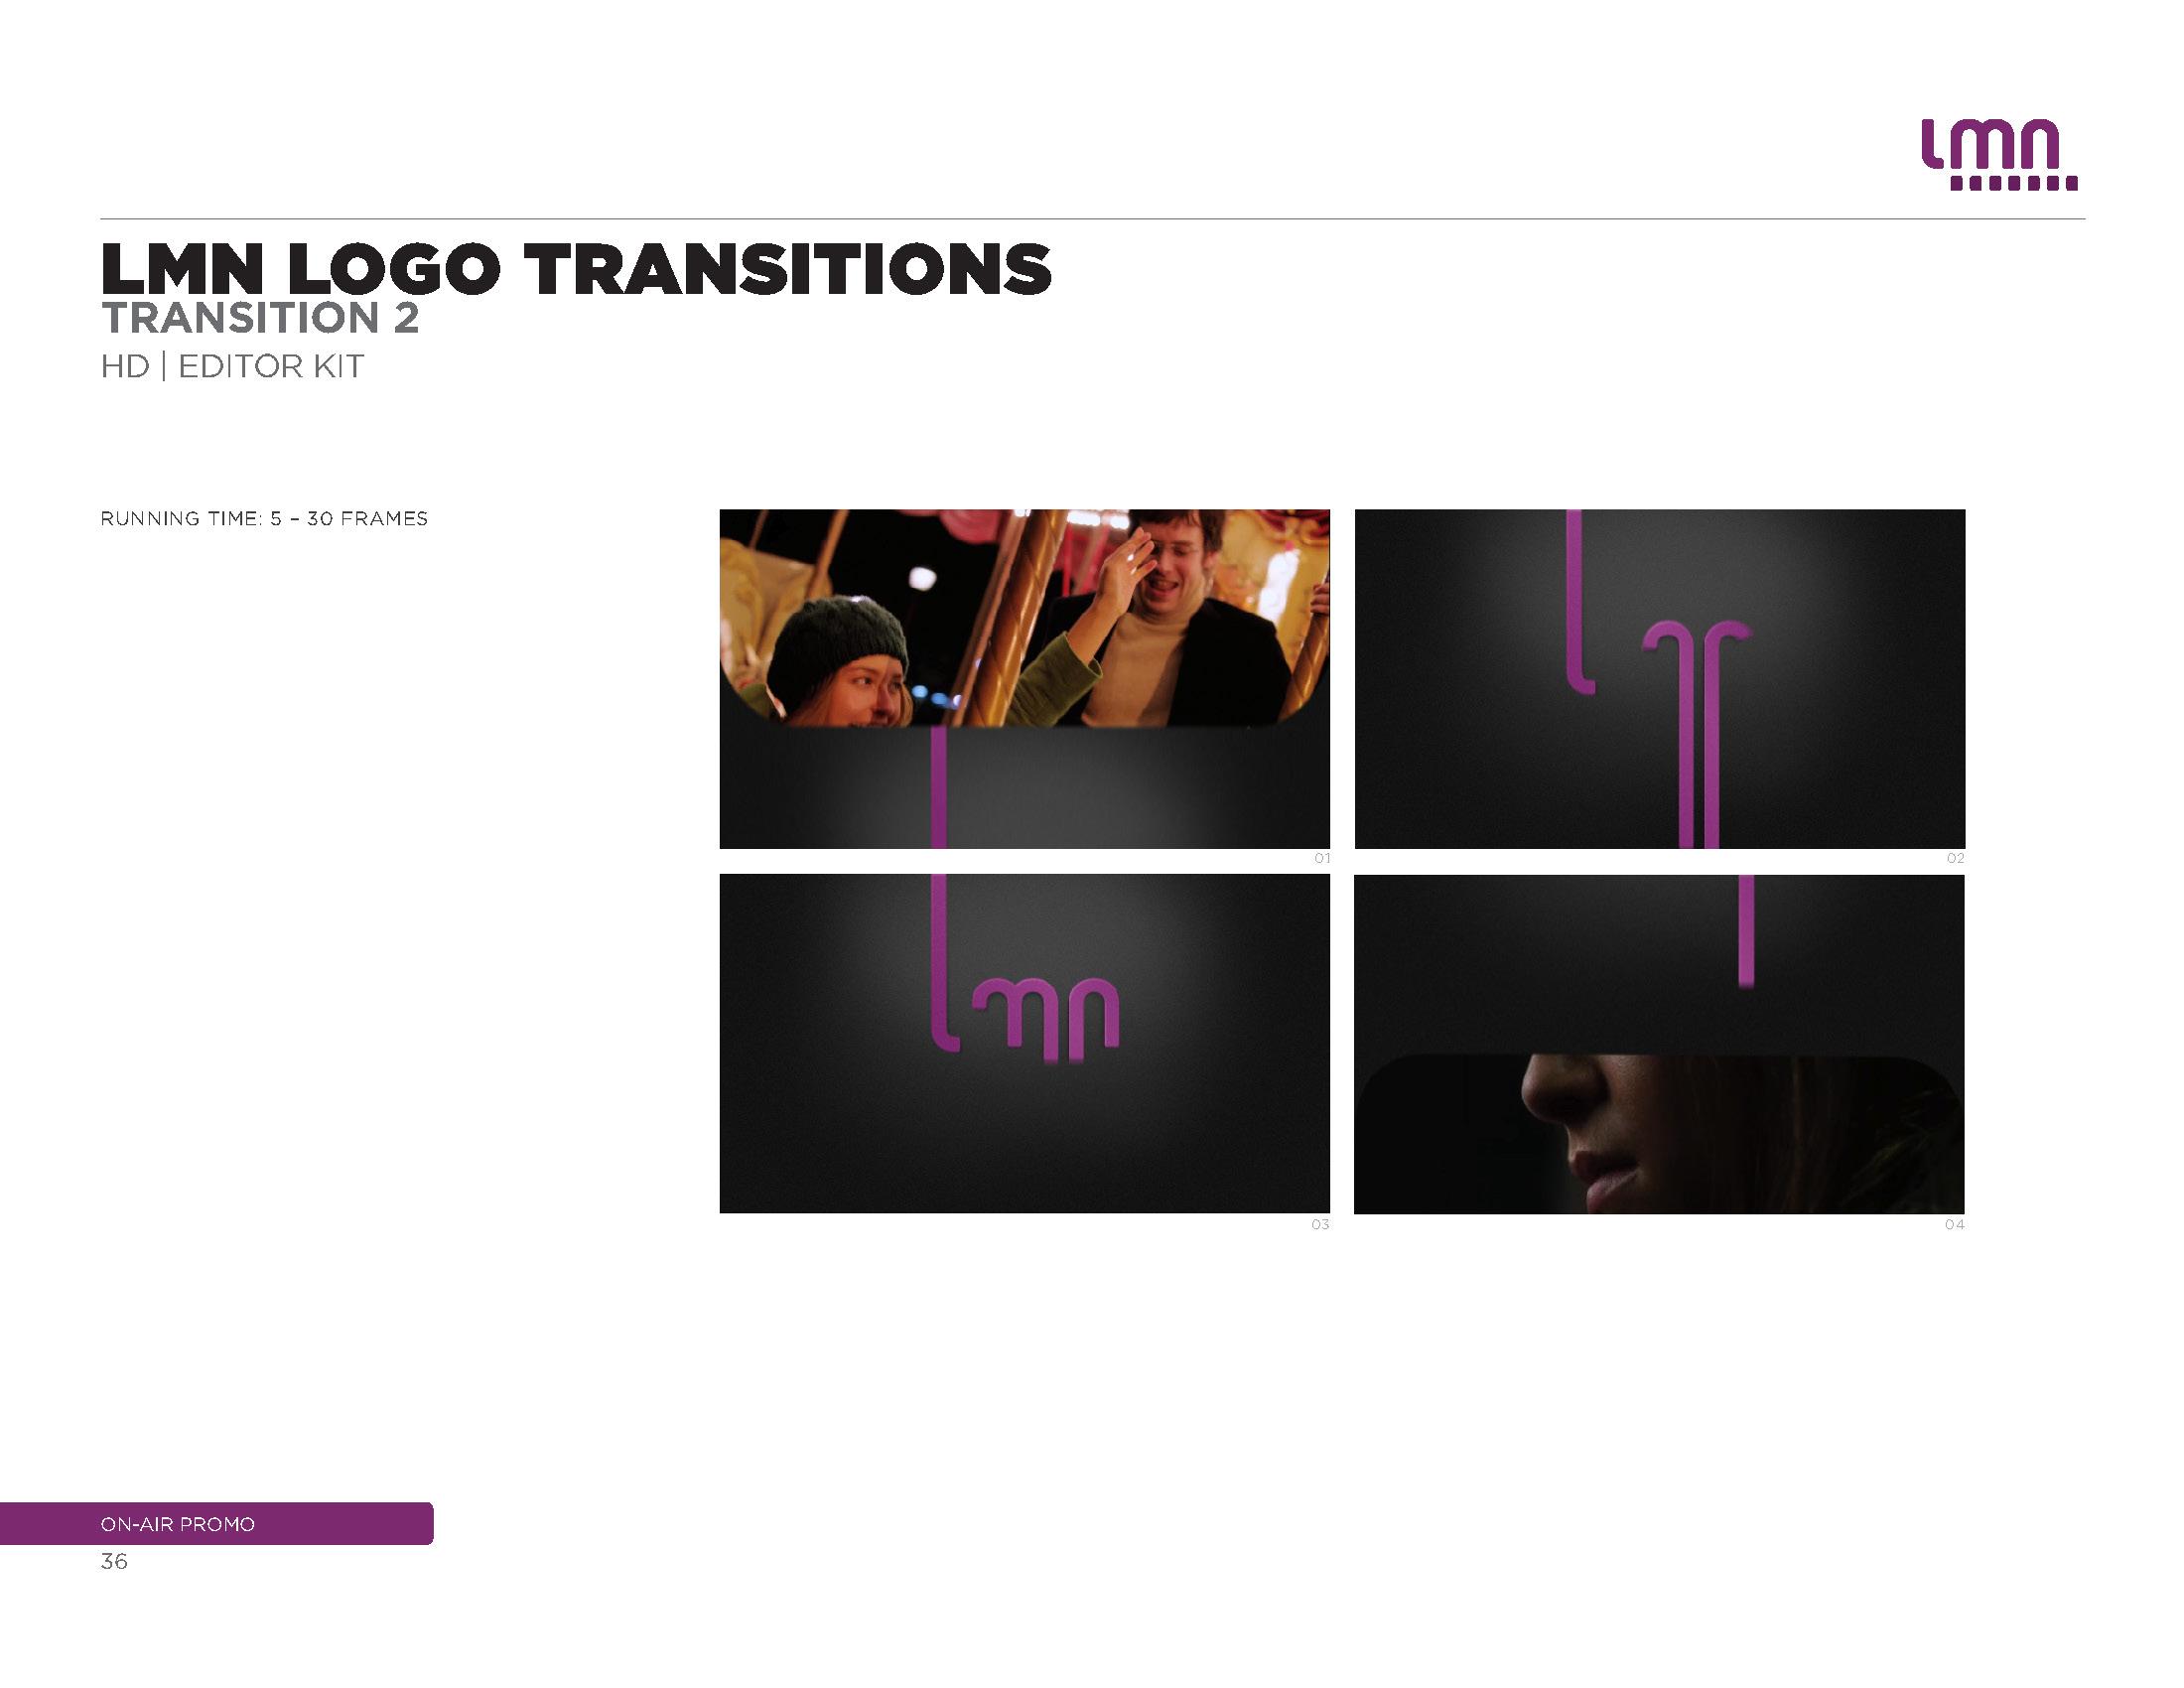 LMN_styleguide_092711_HQ_Page_36.jpg